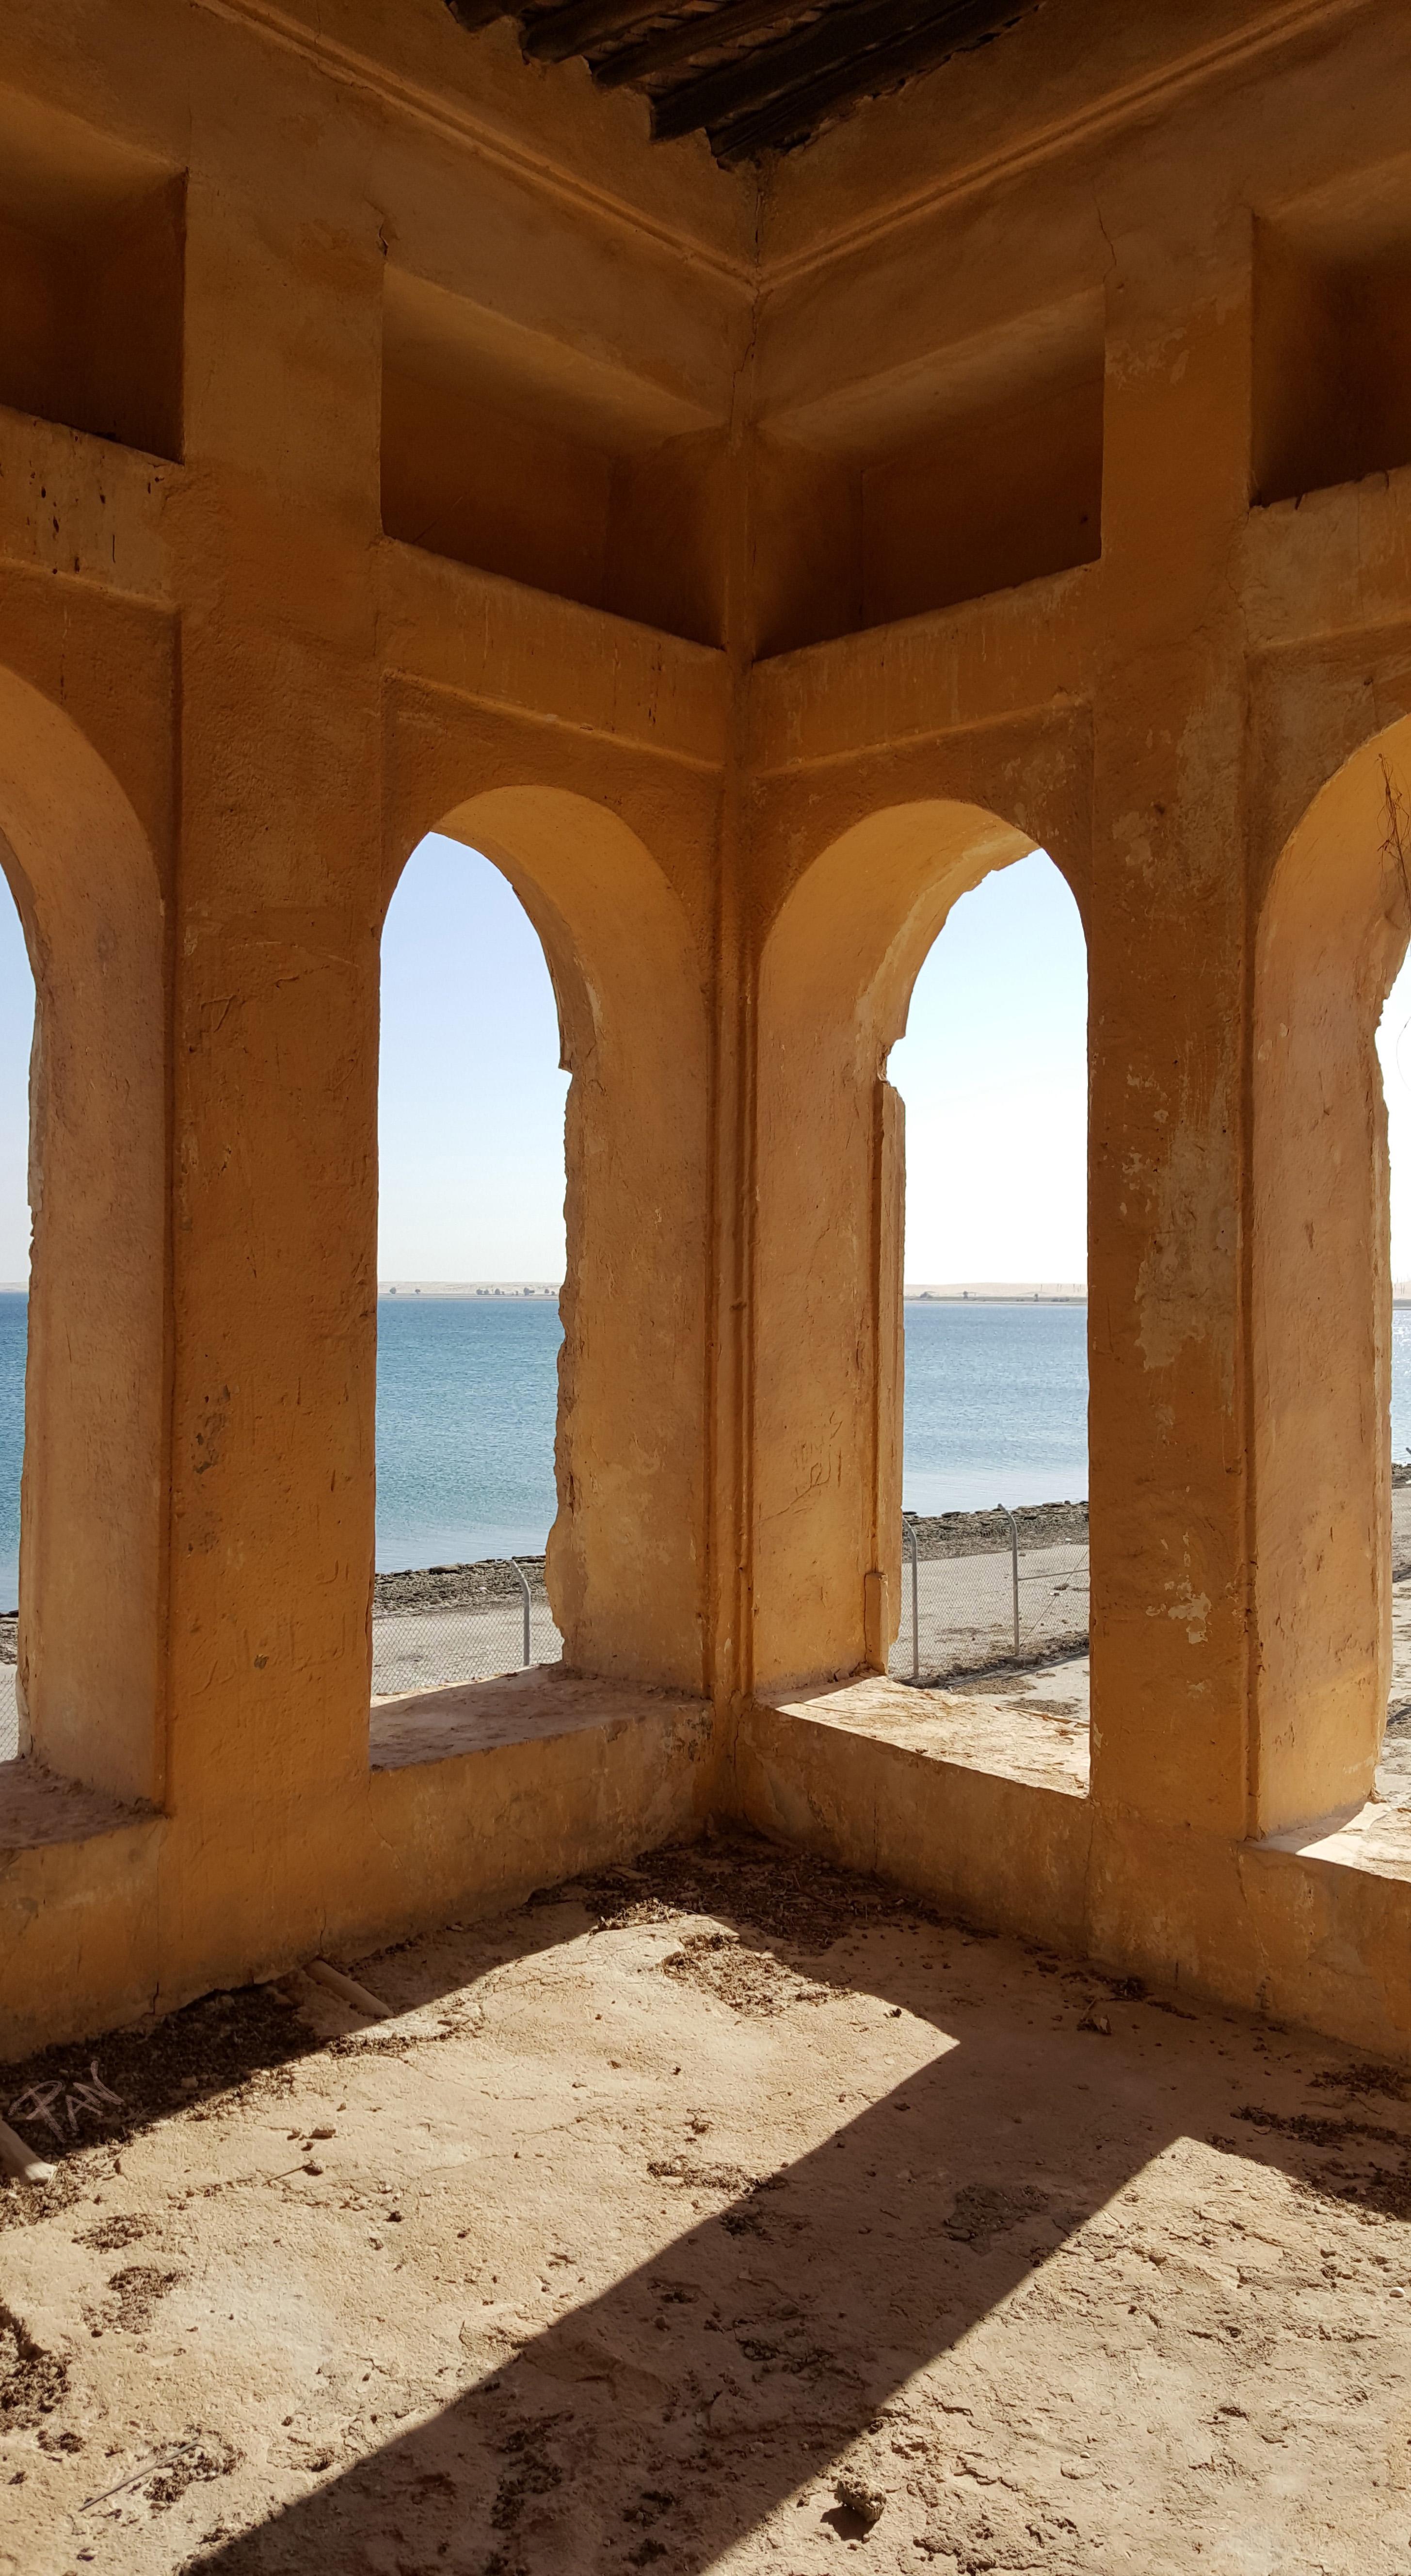 Finestre sul porto antico, presso Al-uqair beach, Arabia Saudita, ph. PaN